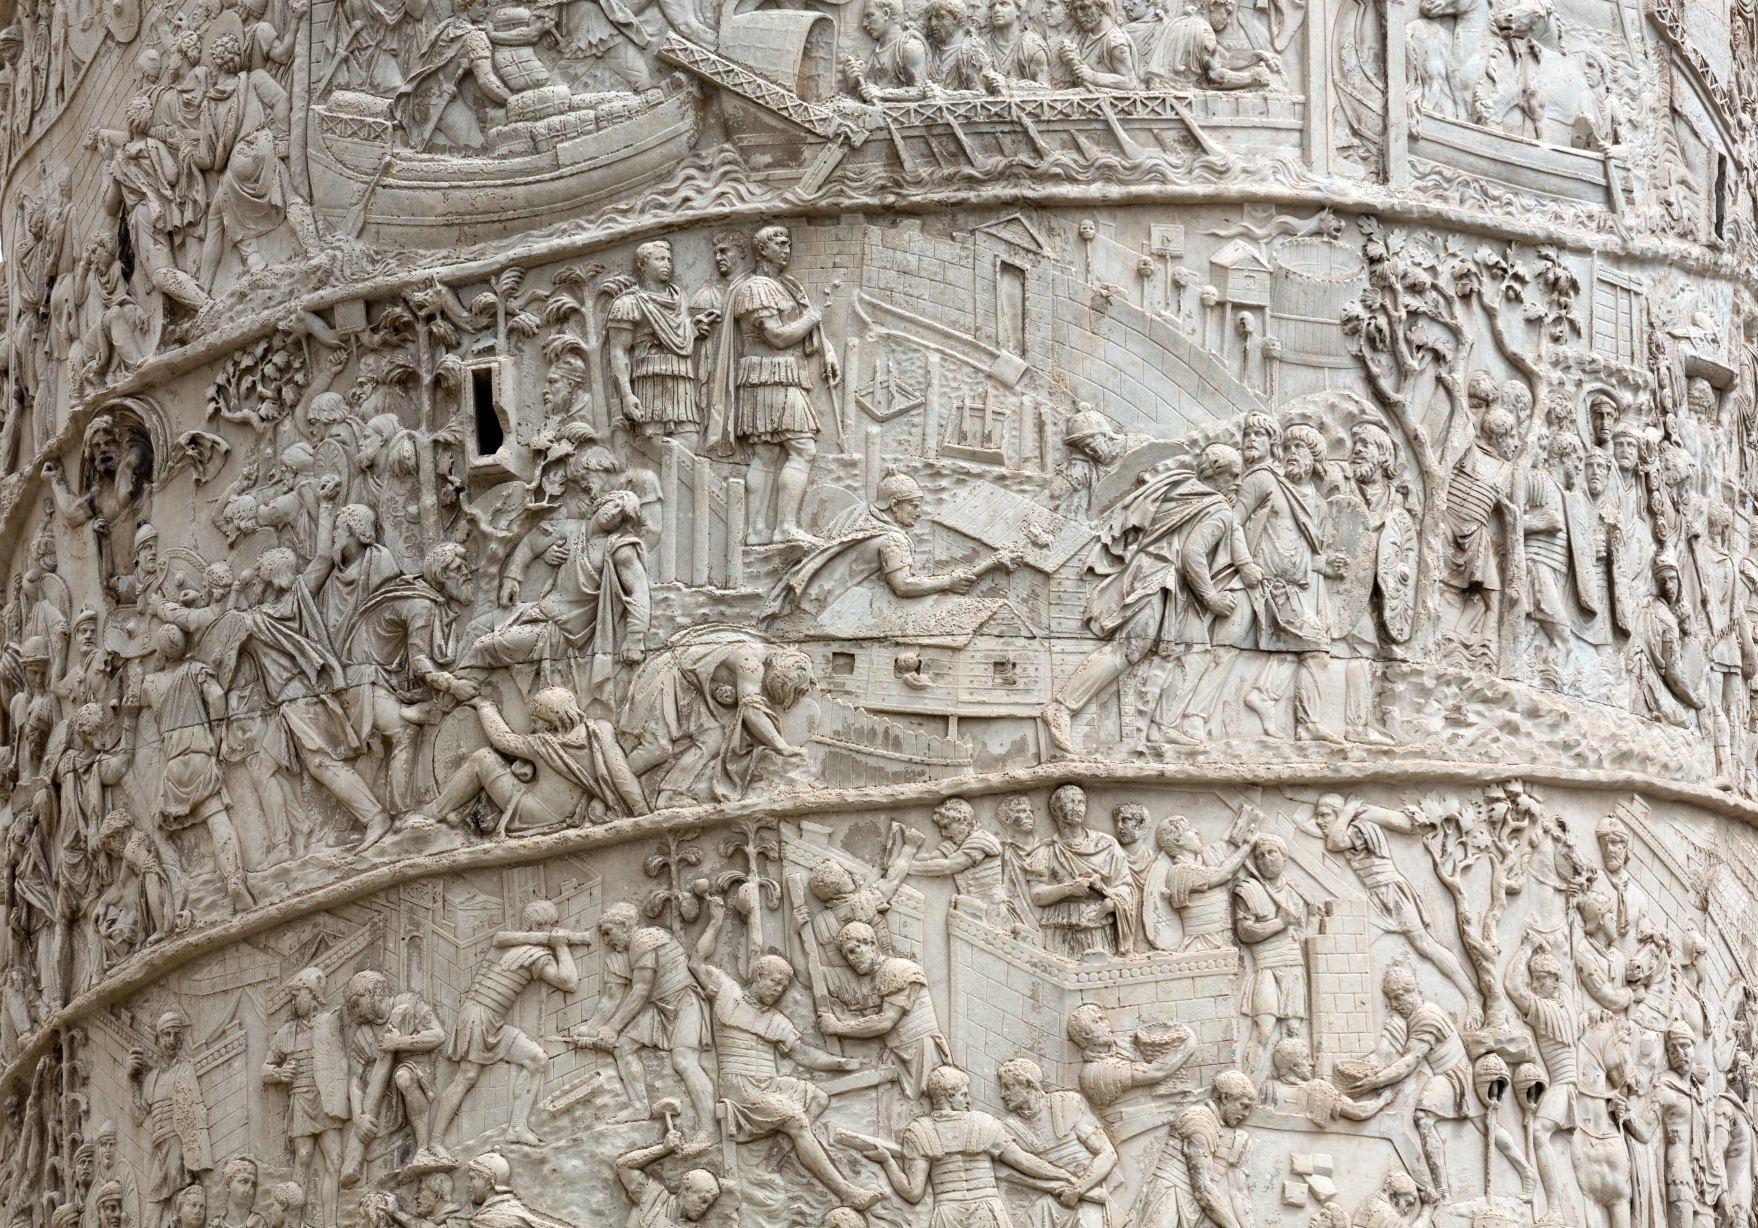 Trajan's Column . Roman triumphal column in Rome, Italy